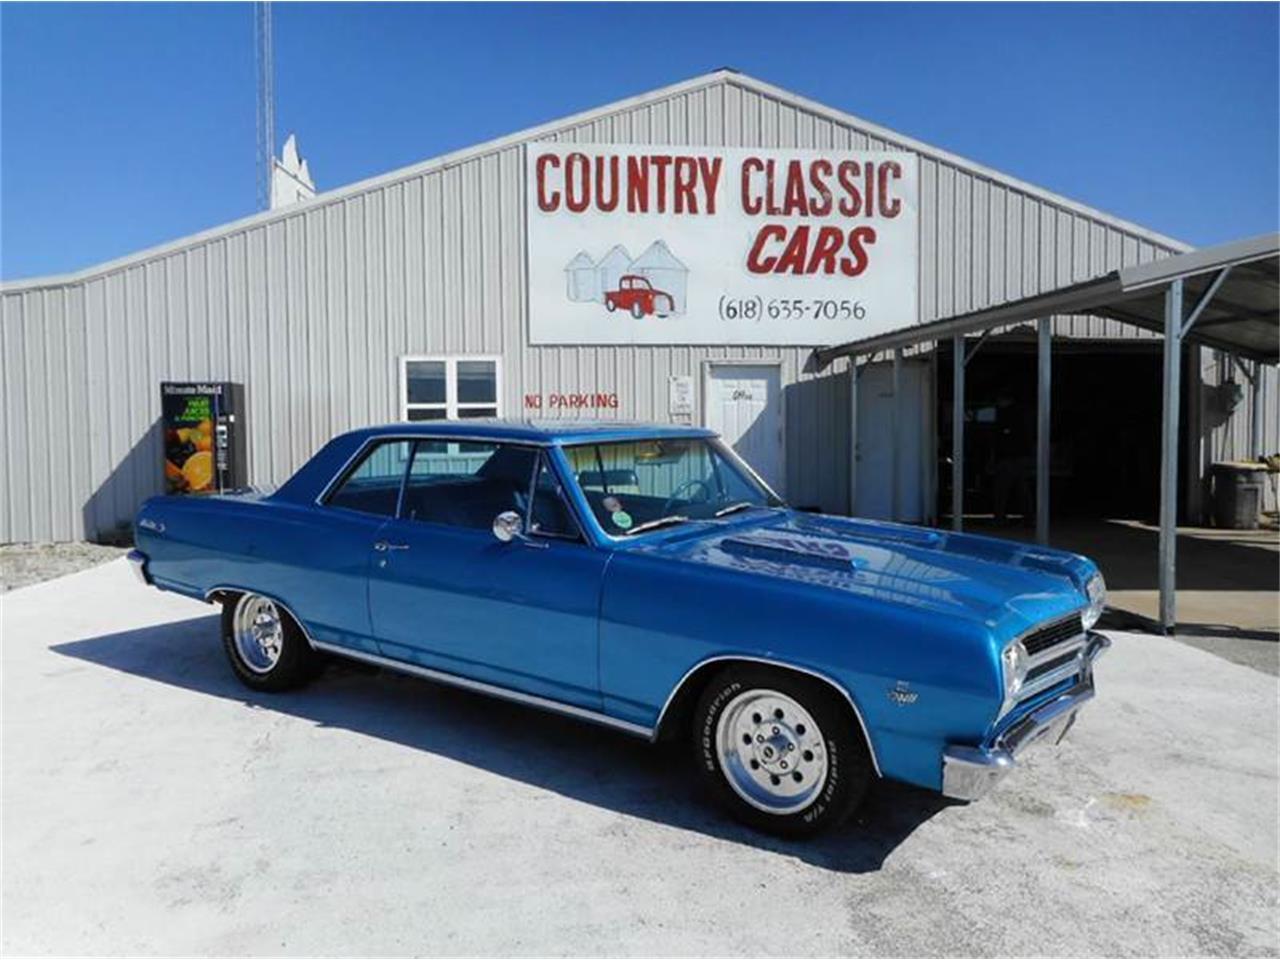 For Sale: 1965 Chevrolet Chevelle SS in Staunton, Illinois